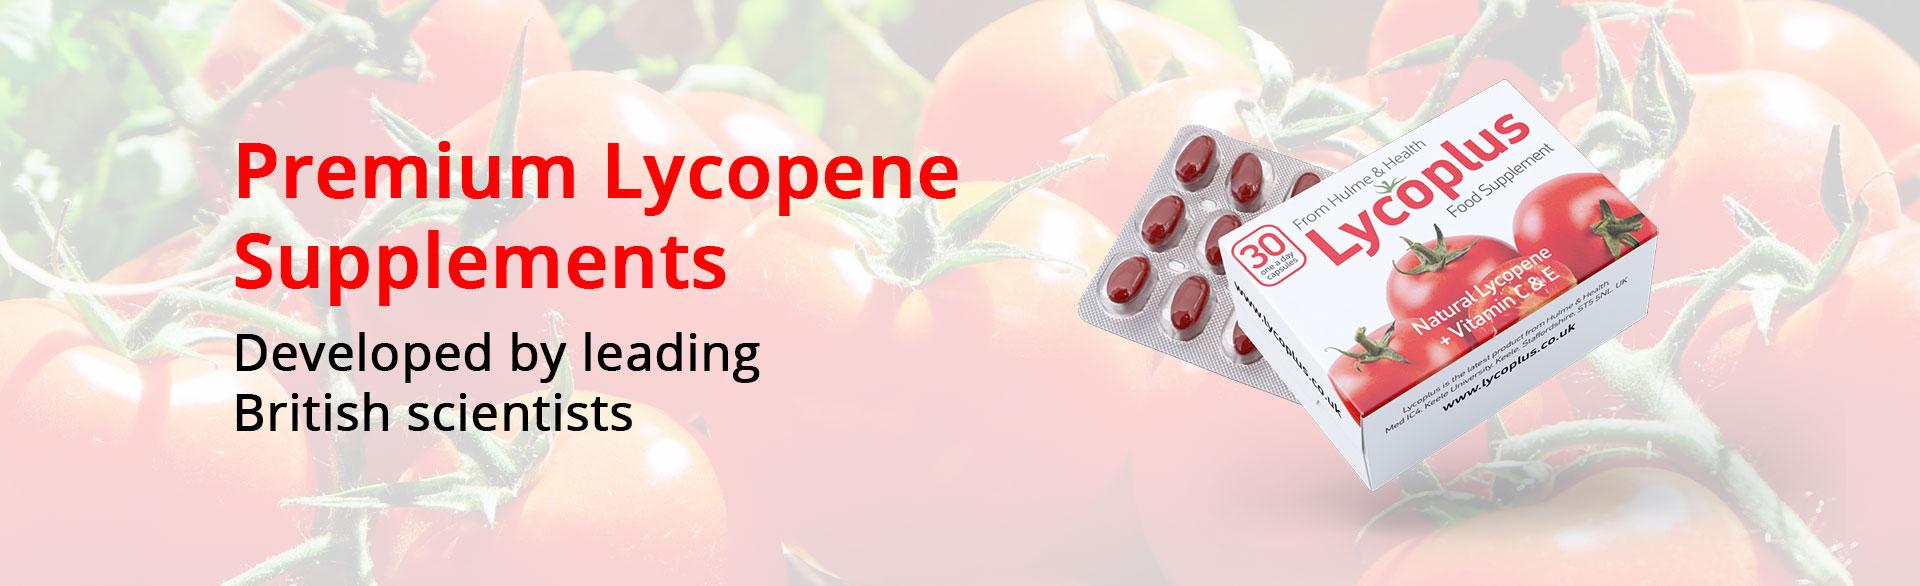 lycopene-supplements-banner